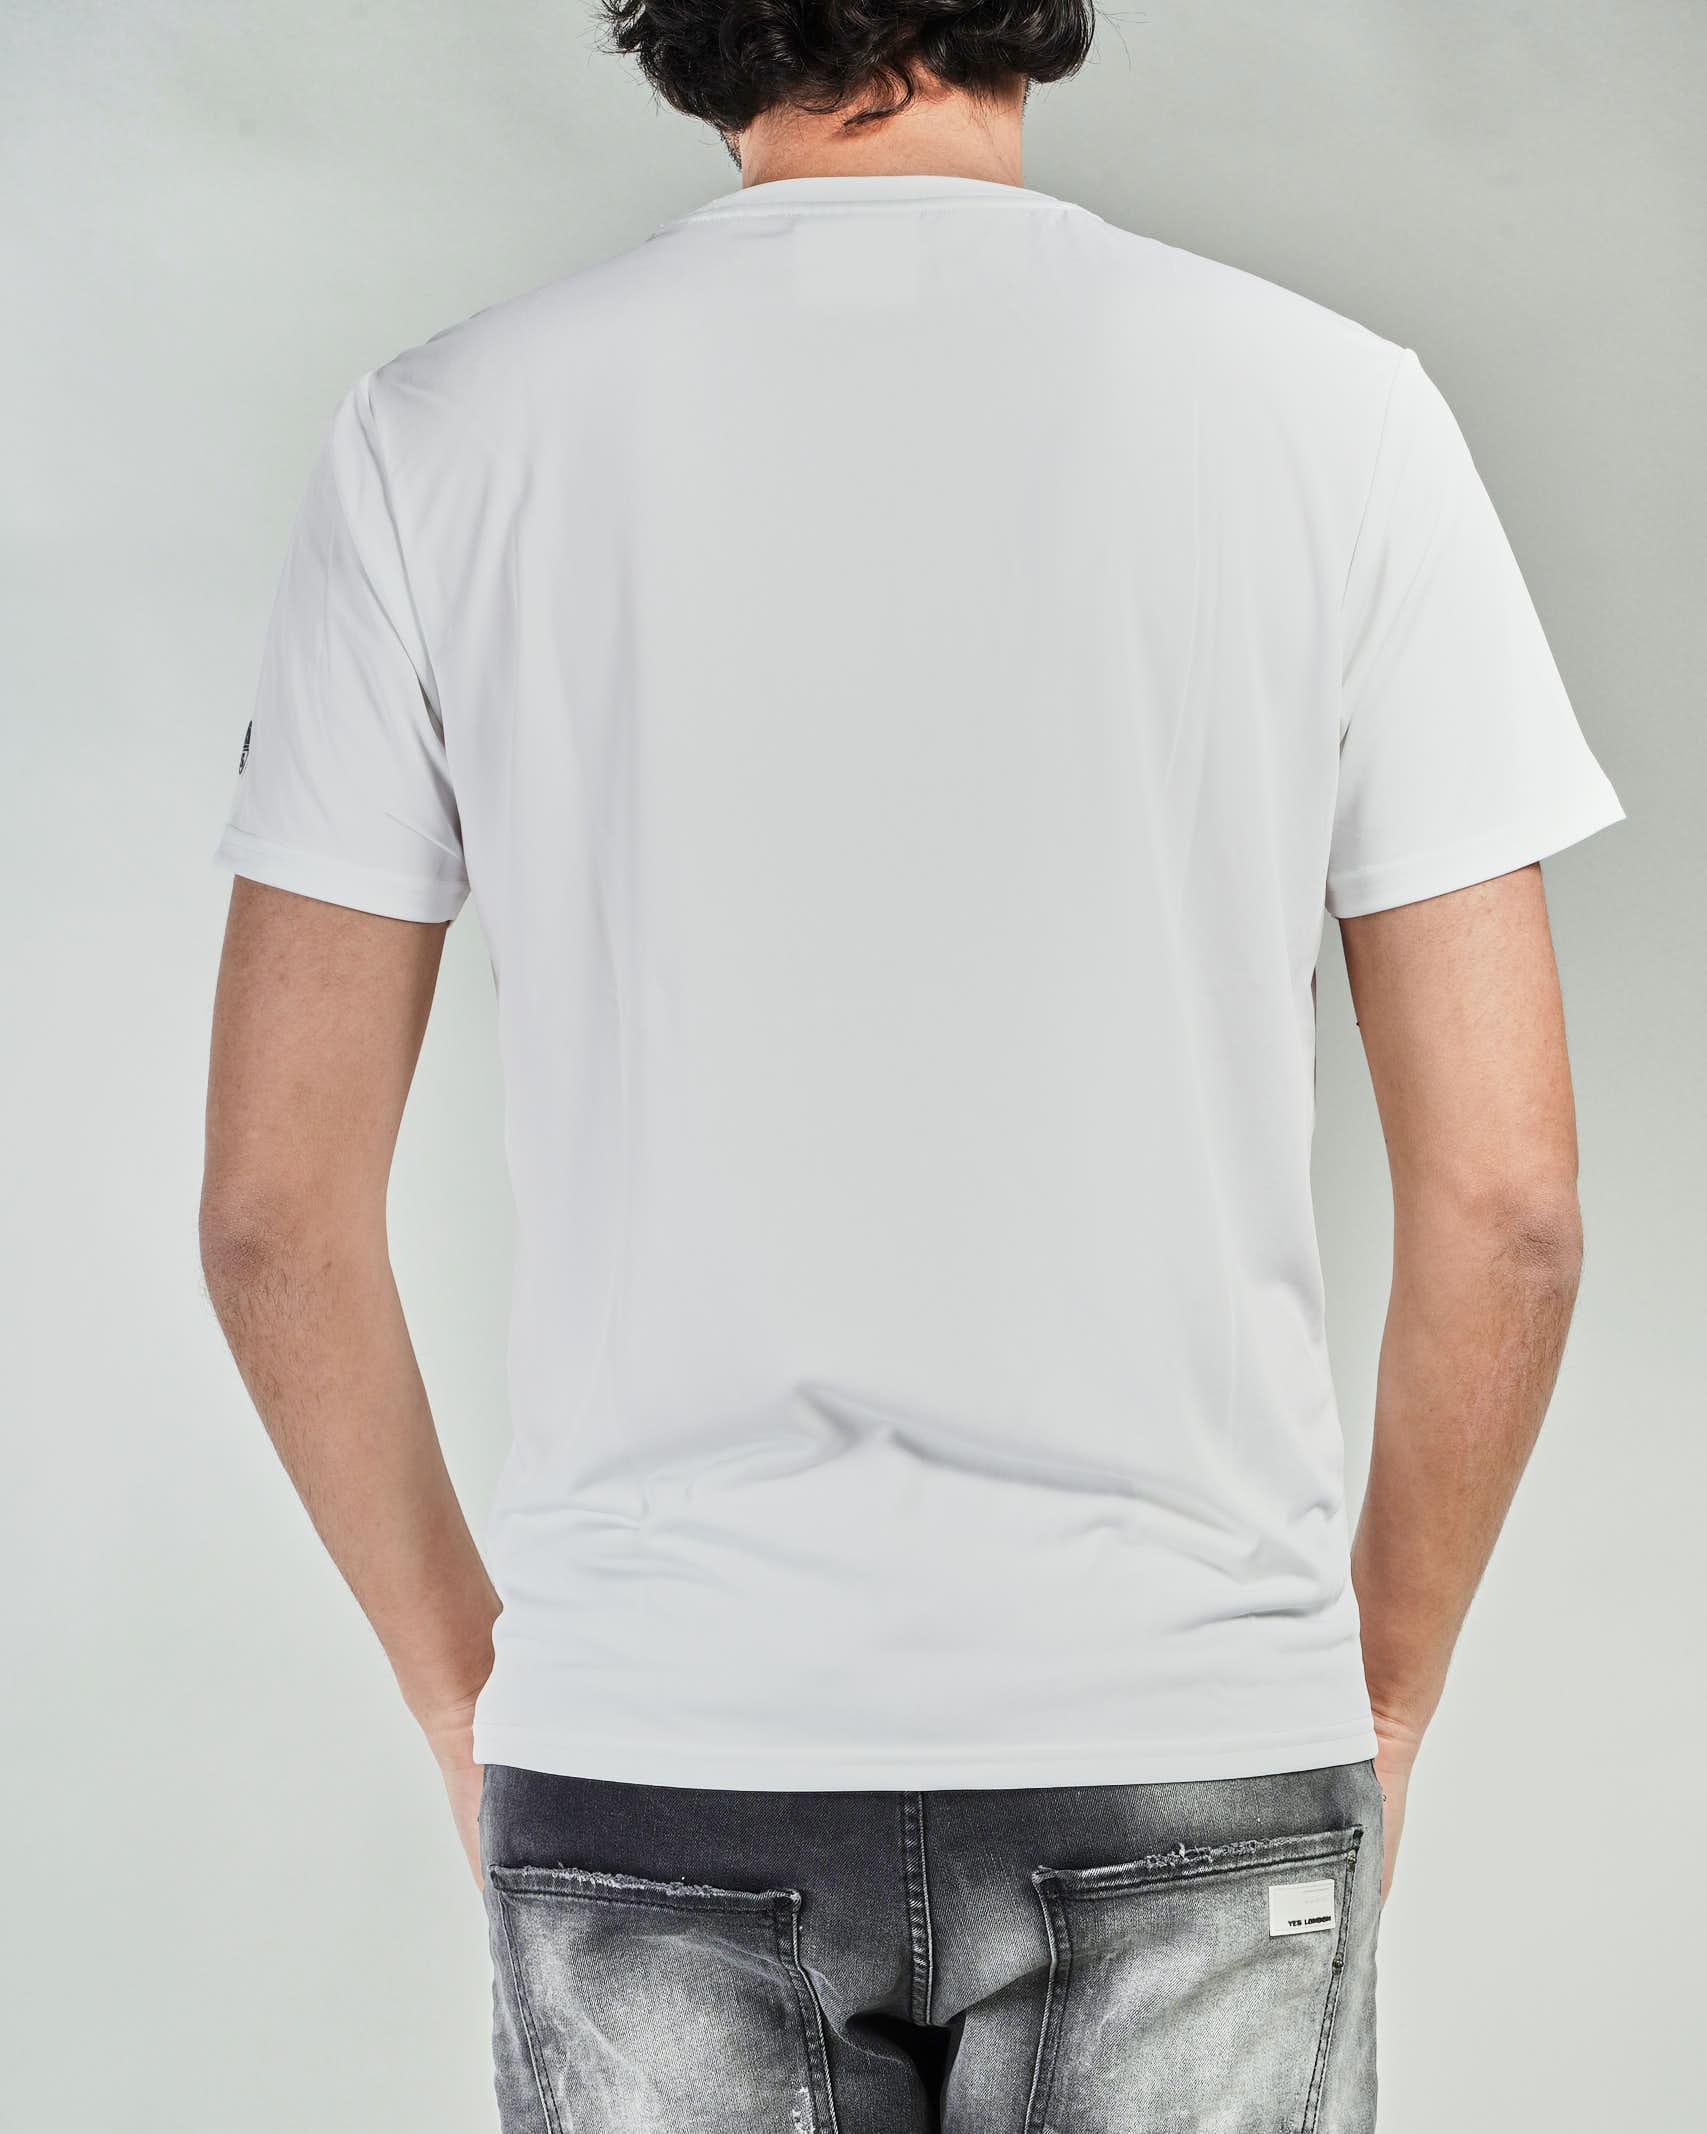 T-shirt con logo North Sails X Prada NORTH SAILS X PRADA   T-shirt   452307101